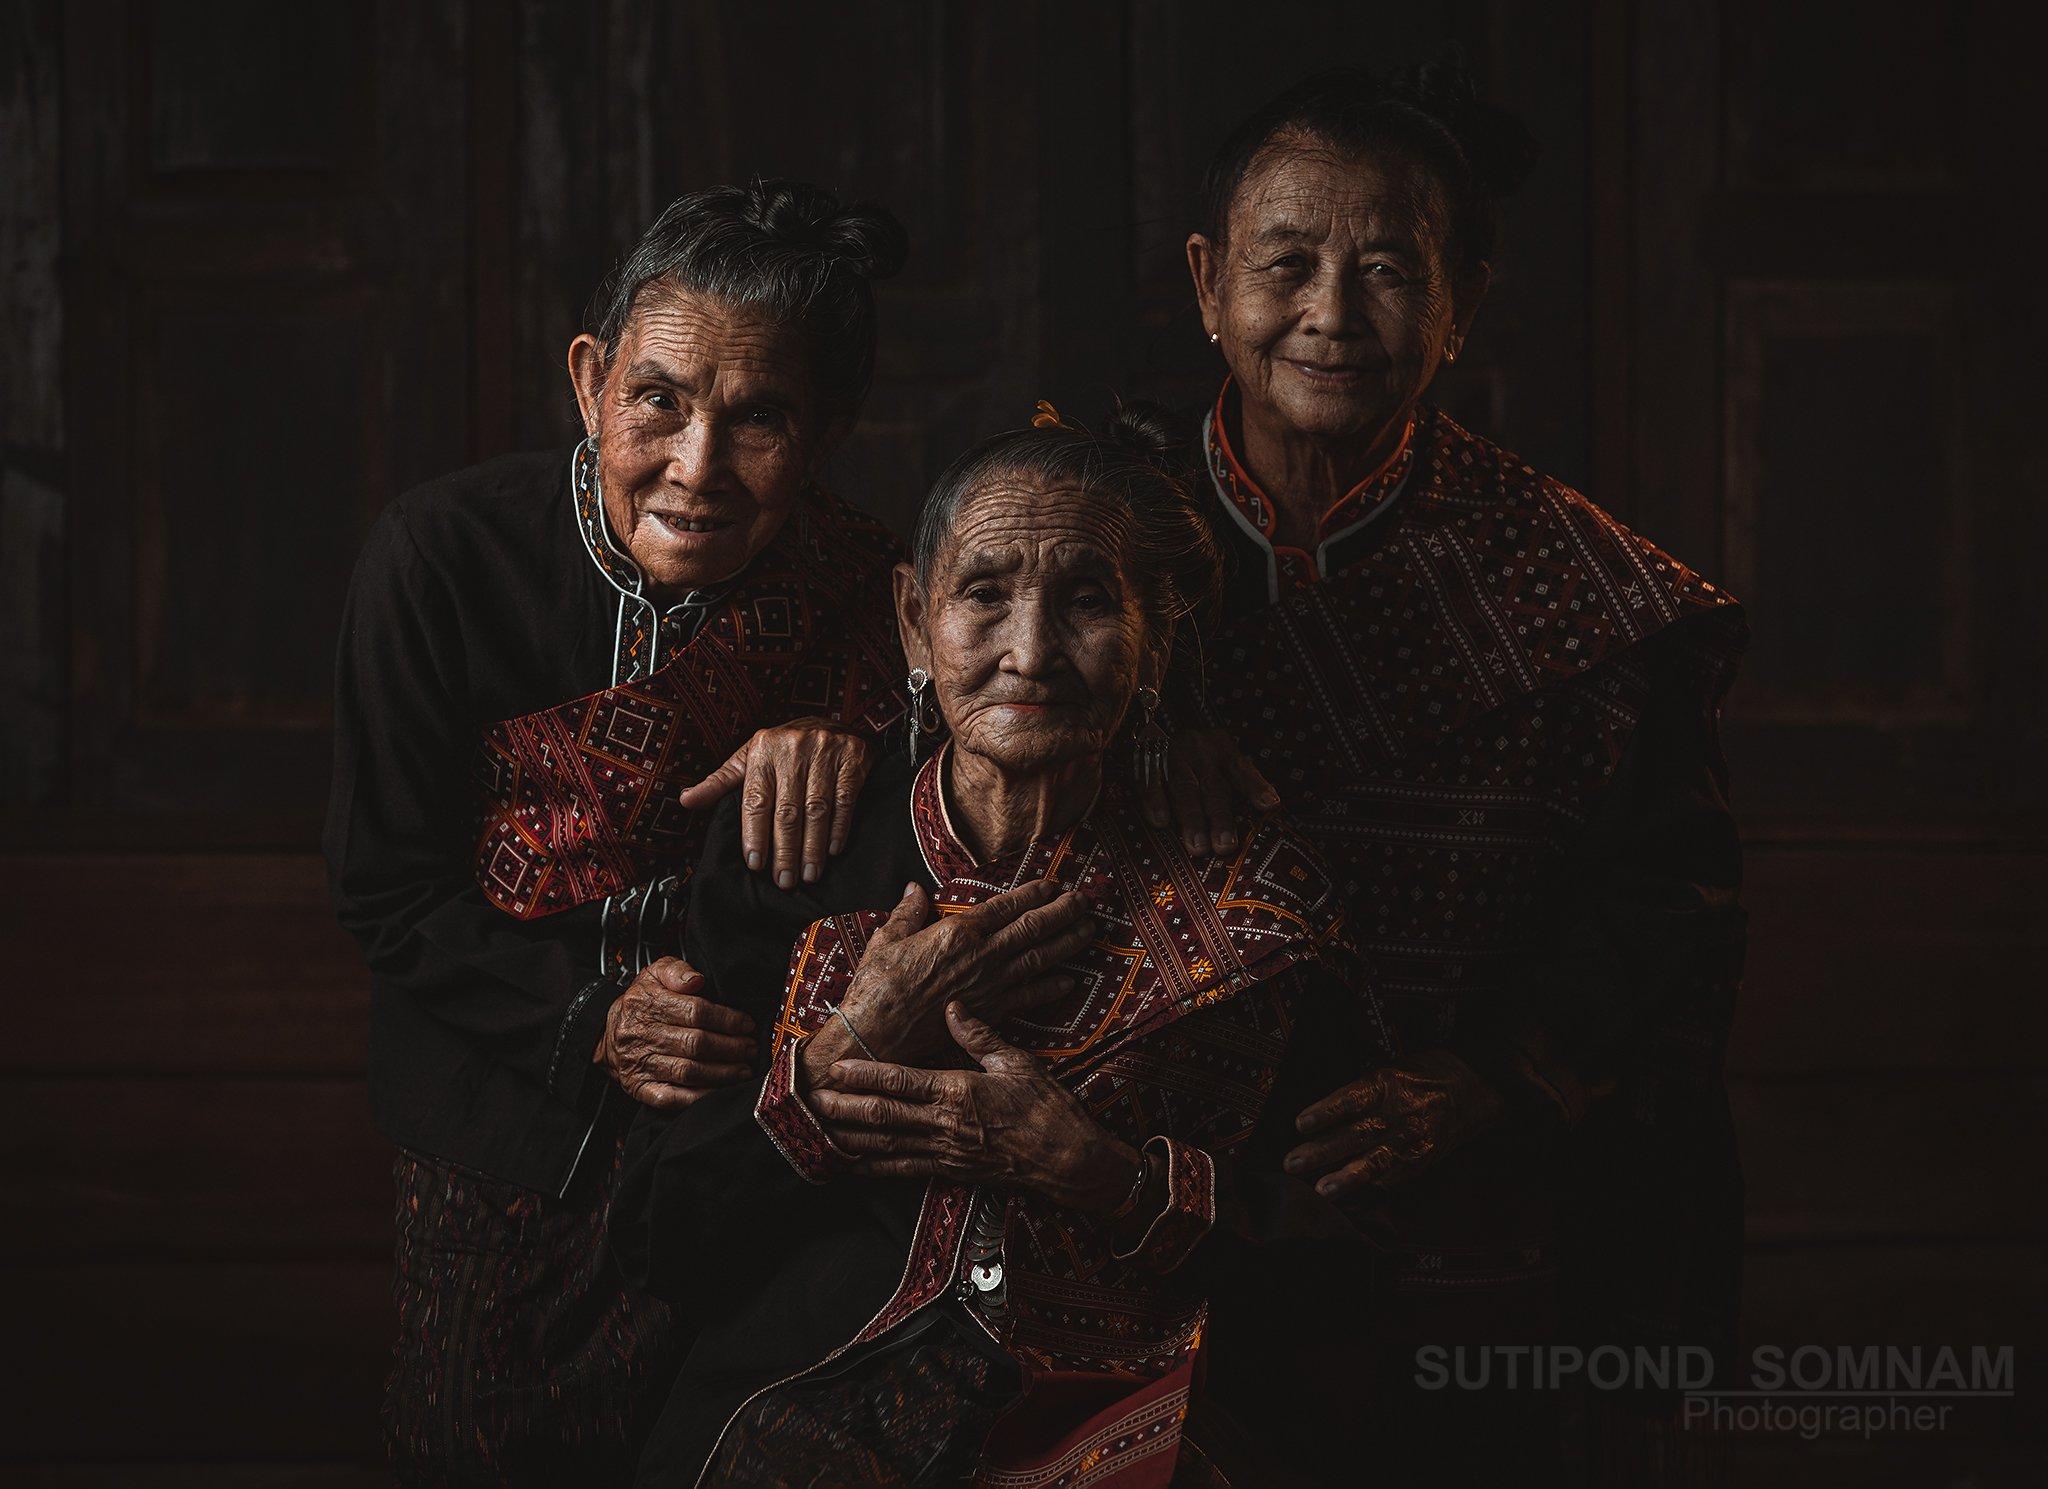 portrait, SUTIPOND SOMNAM